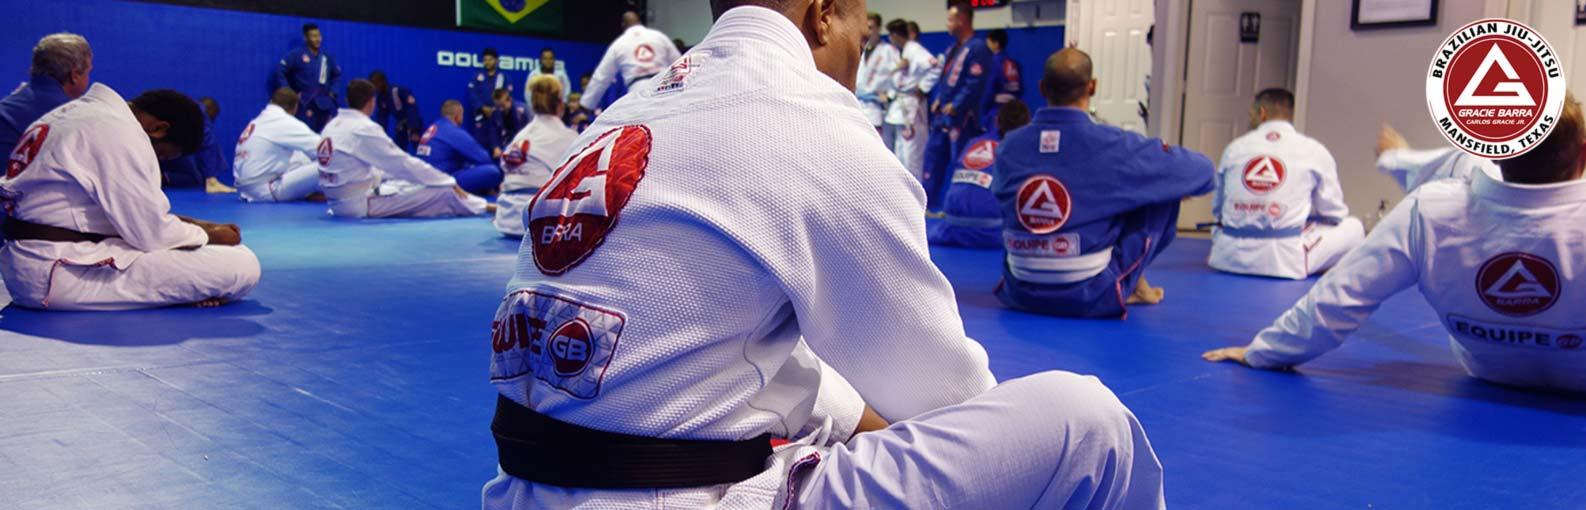 Jiu Jitsu For Everyone | Gracie Barra Mansfield | Brazilian